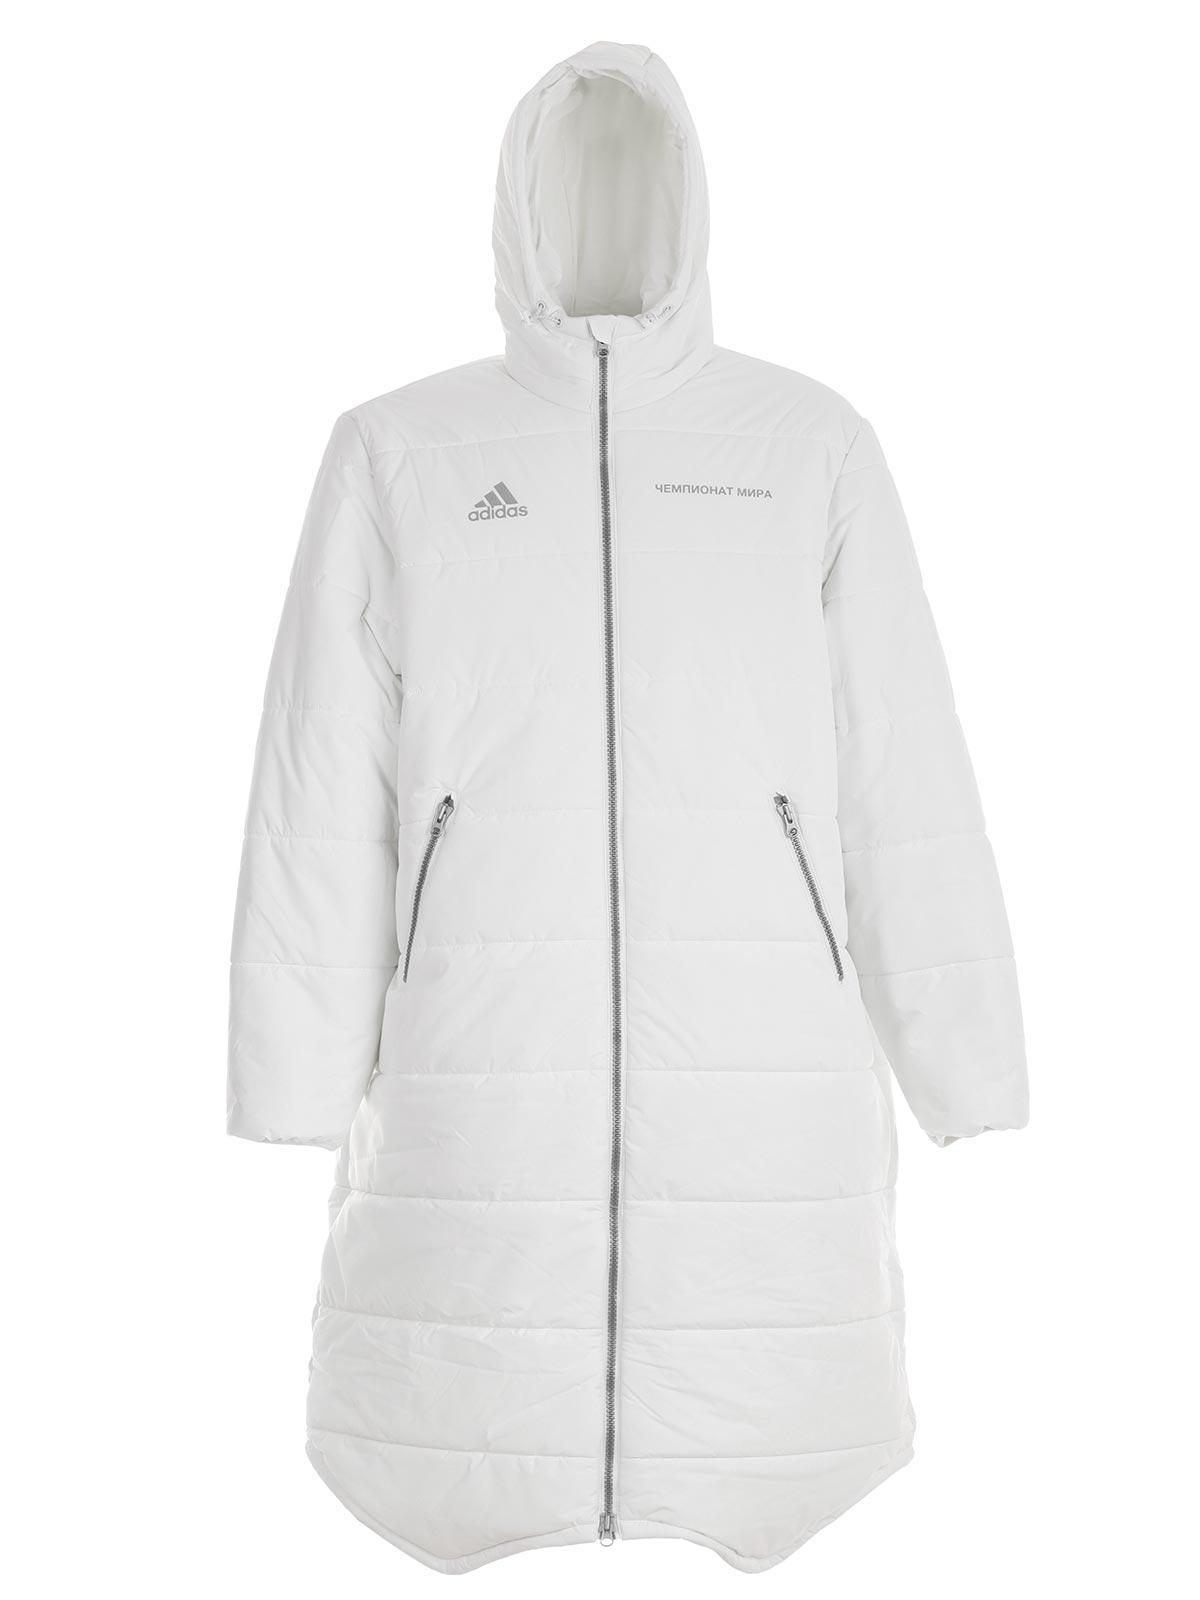 d2c84480 Gosha Rubchinskiy Cappotto Adidas in White for Men - Lyst